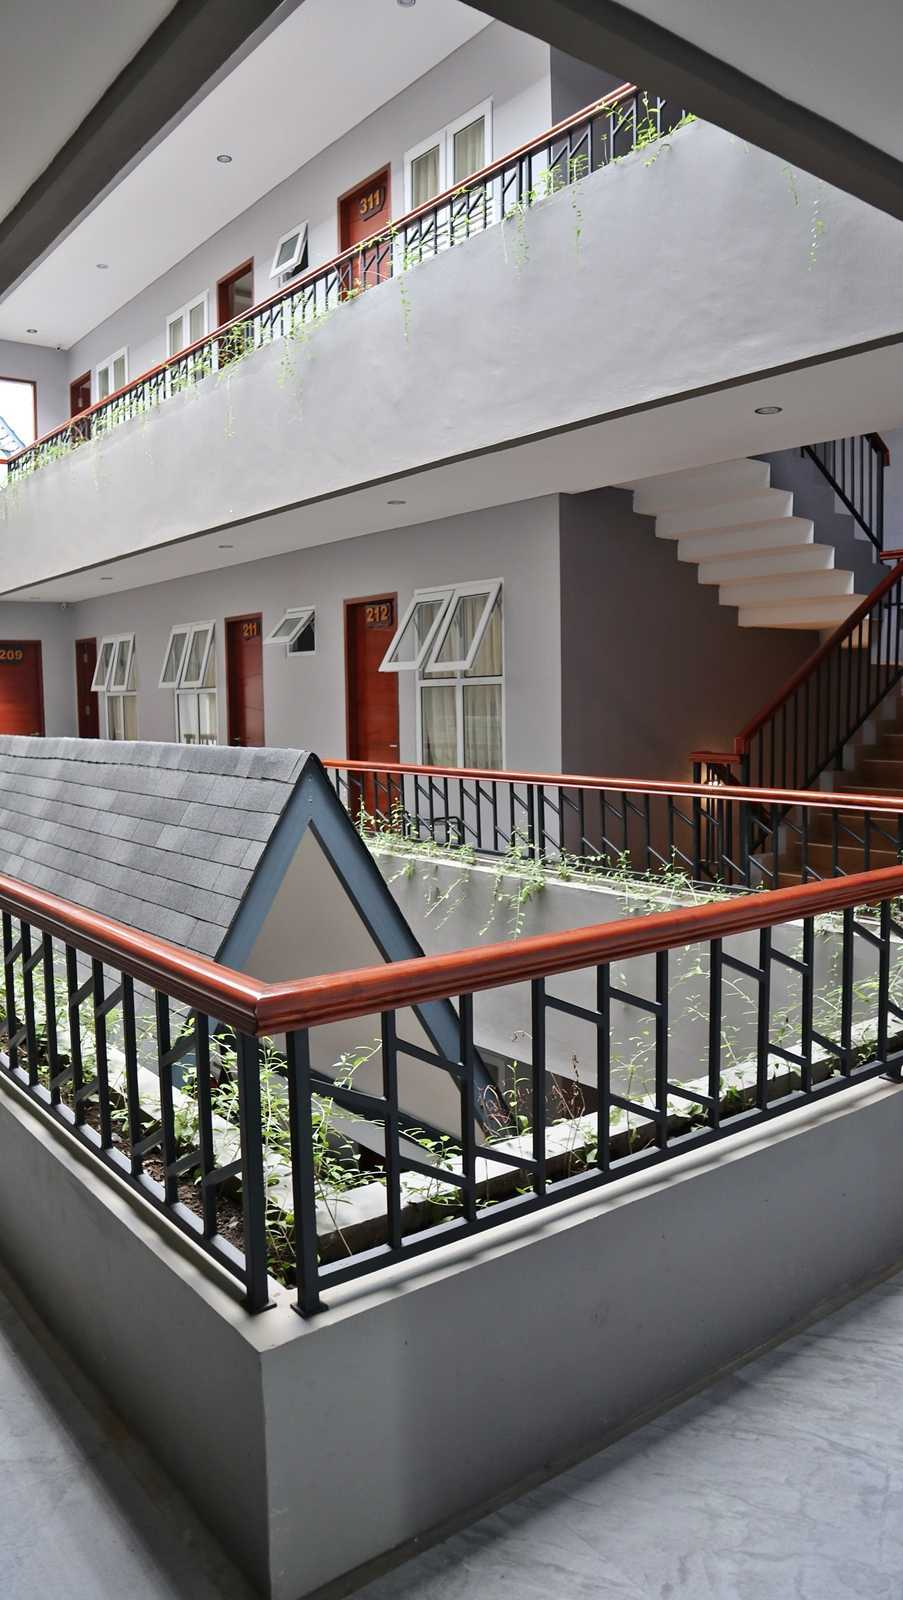 Bd Studio Gold House Medan, Kota Medan, Sumatera Utara, Indonesia Medan, Kota Medan, Sumatera Utara, Indonesia Bd-Studio-Gold-House   80753